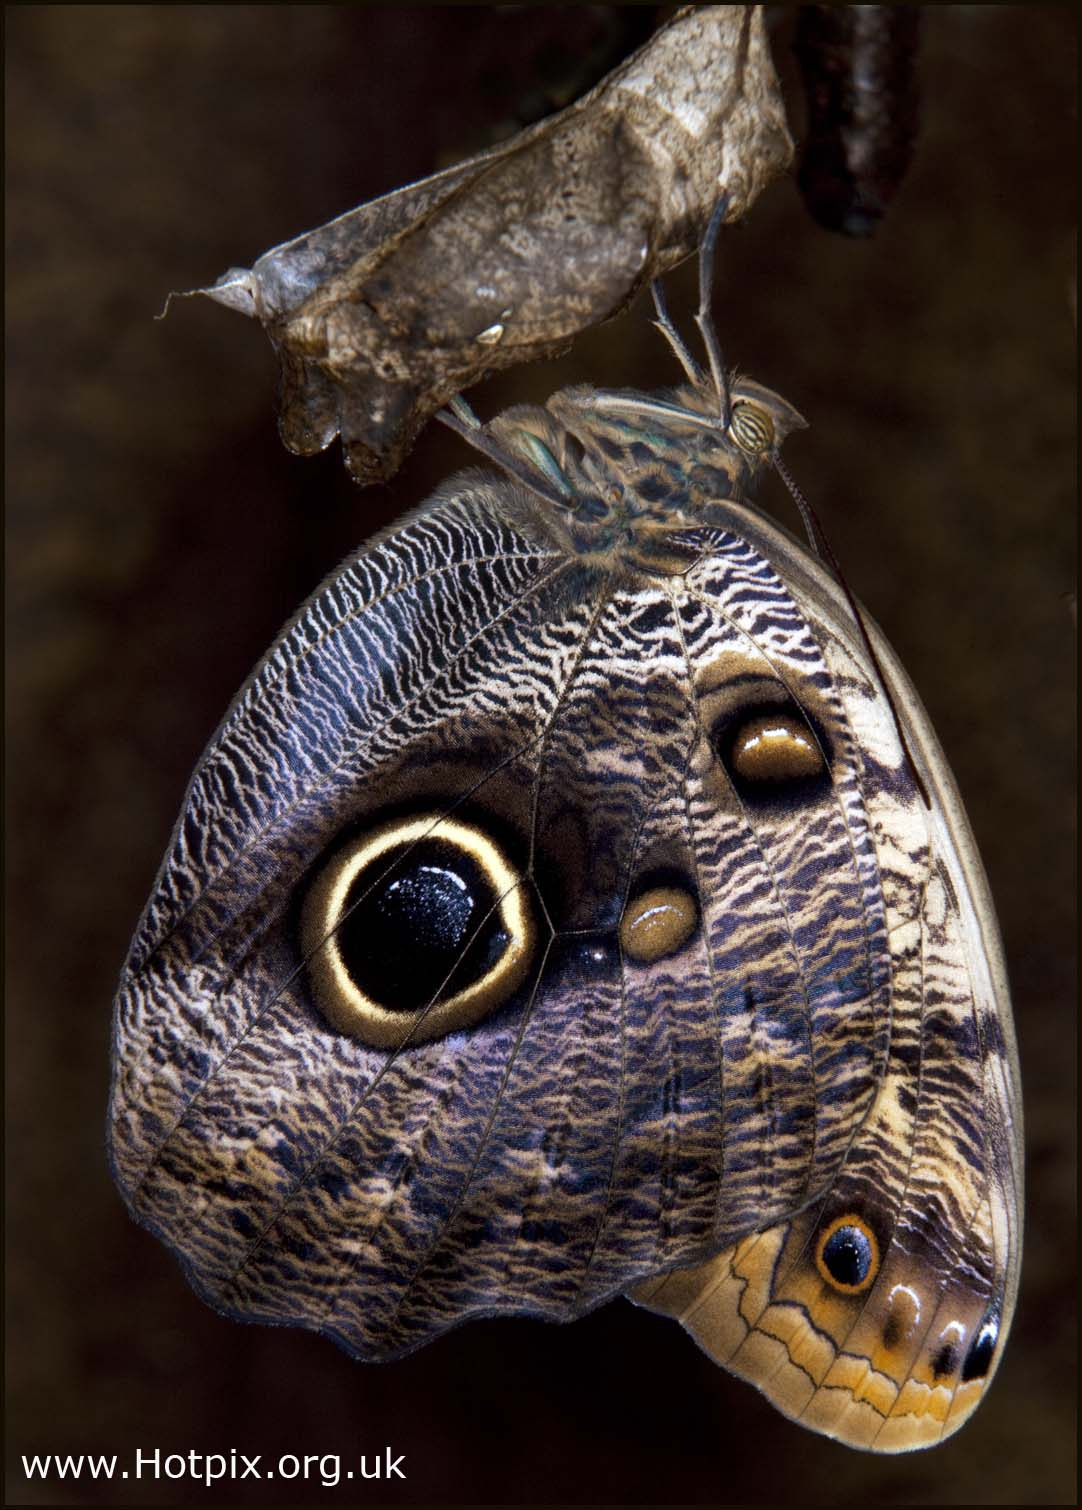 Blue,Morpho,Butterfly,Emerging,Chrysalis,wings,eye,pupa,macro,bellows,close,up,closeup,mexico,central,america,hotpix,hotpixuk,tonysmith,tony,smith,pupae,bluemorpho